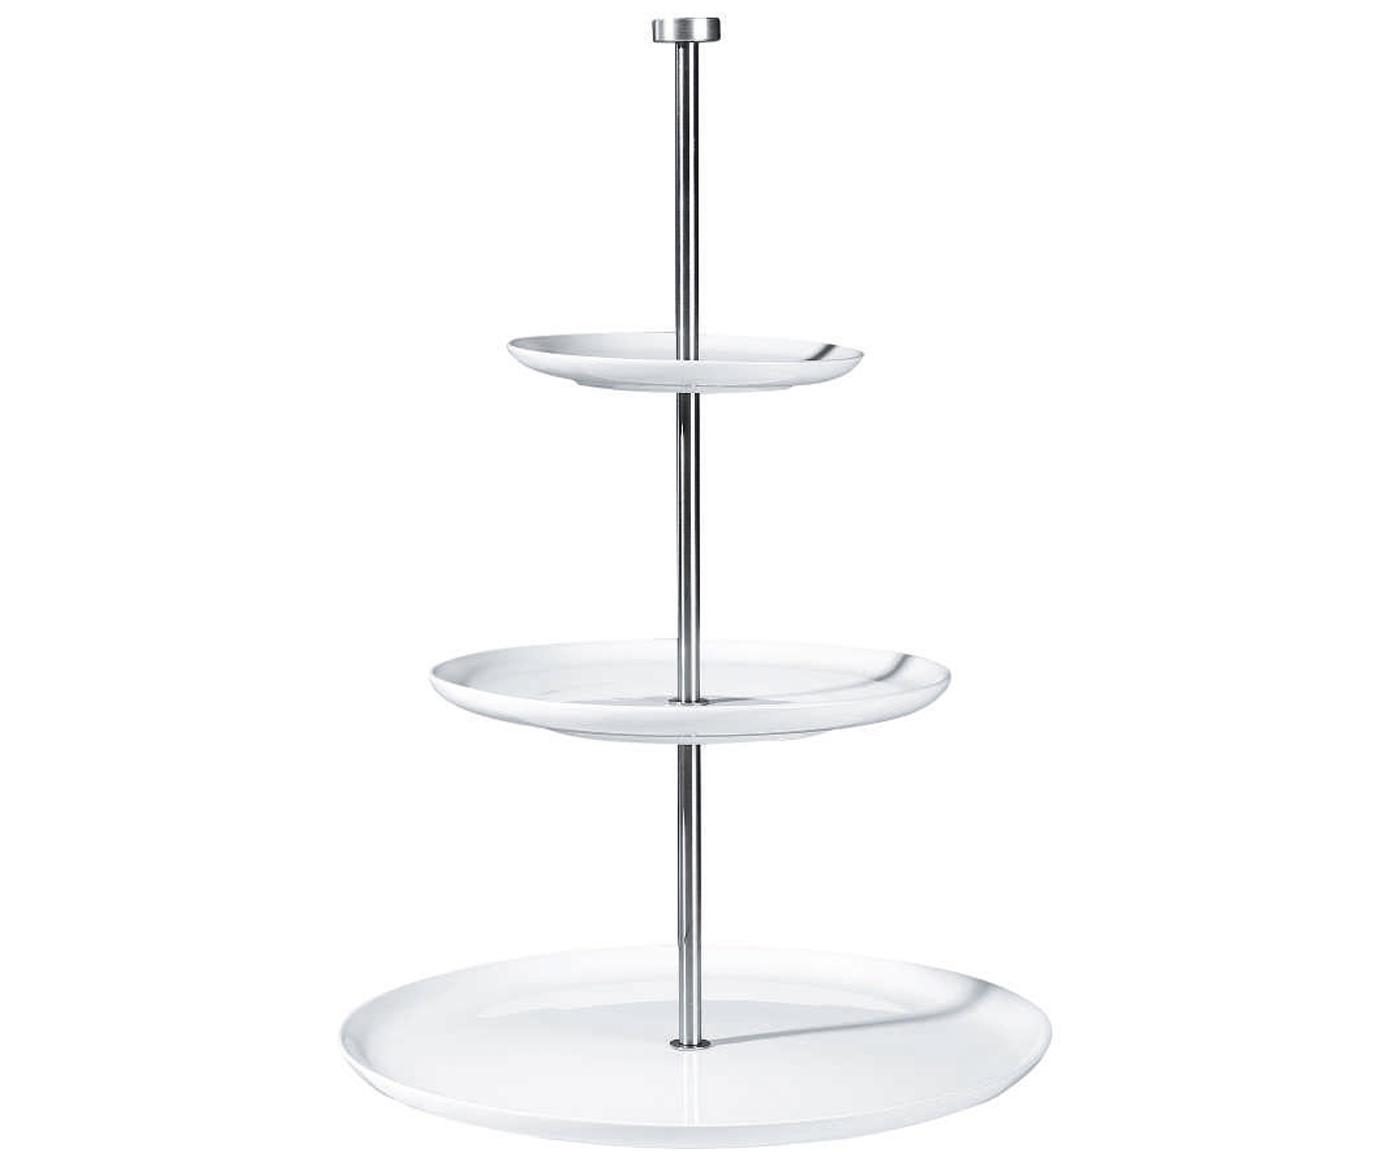 Etagere Kier, Keramik, Metall, Weiss, Ø 30 x H 47 cm